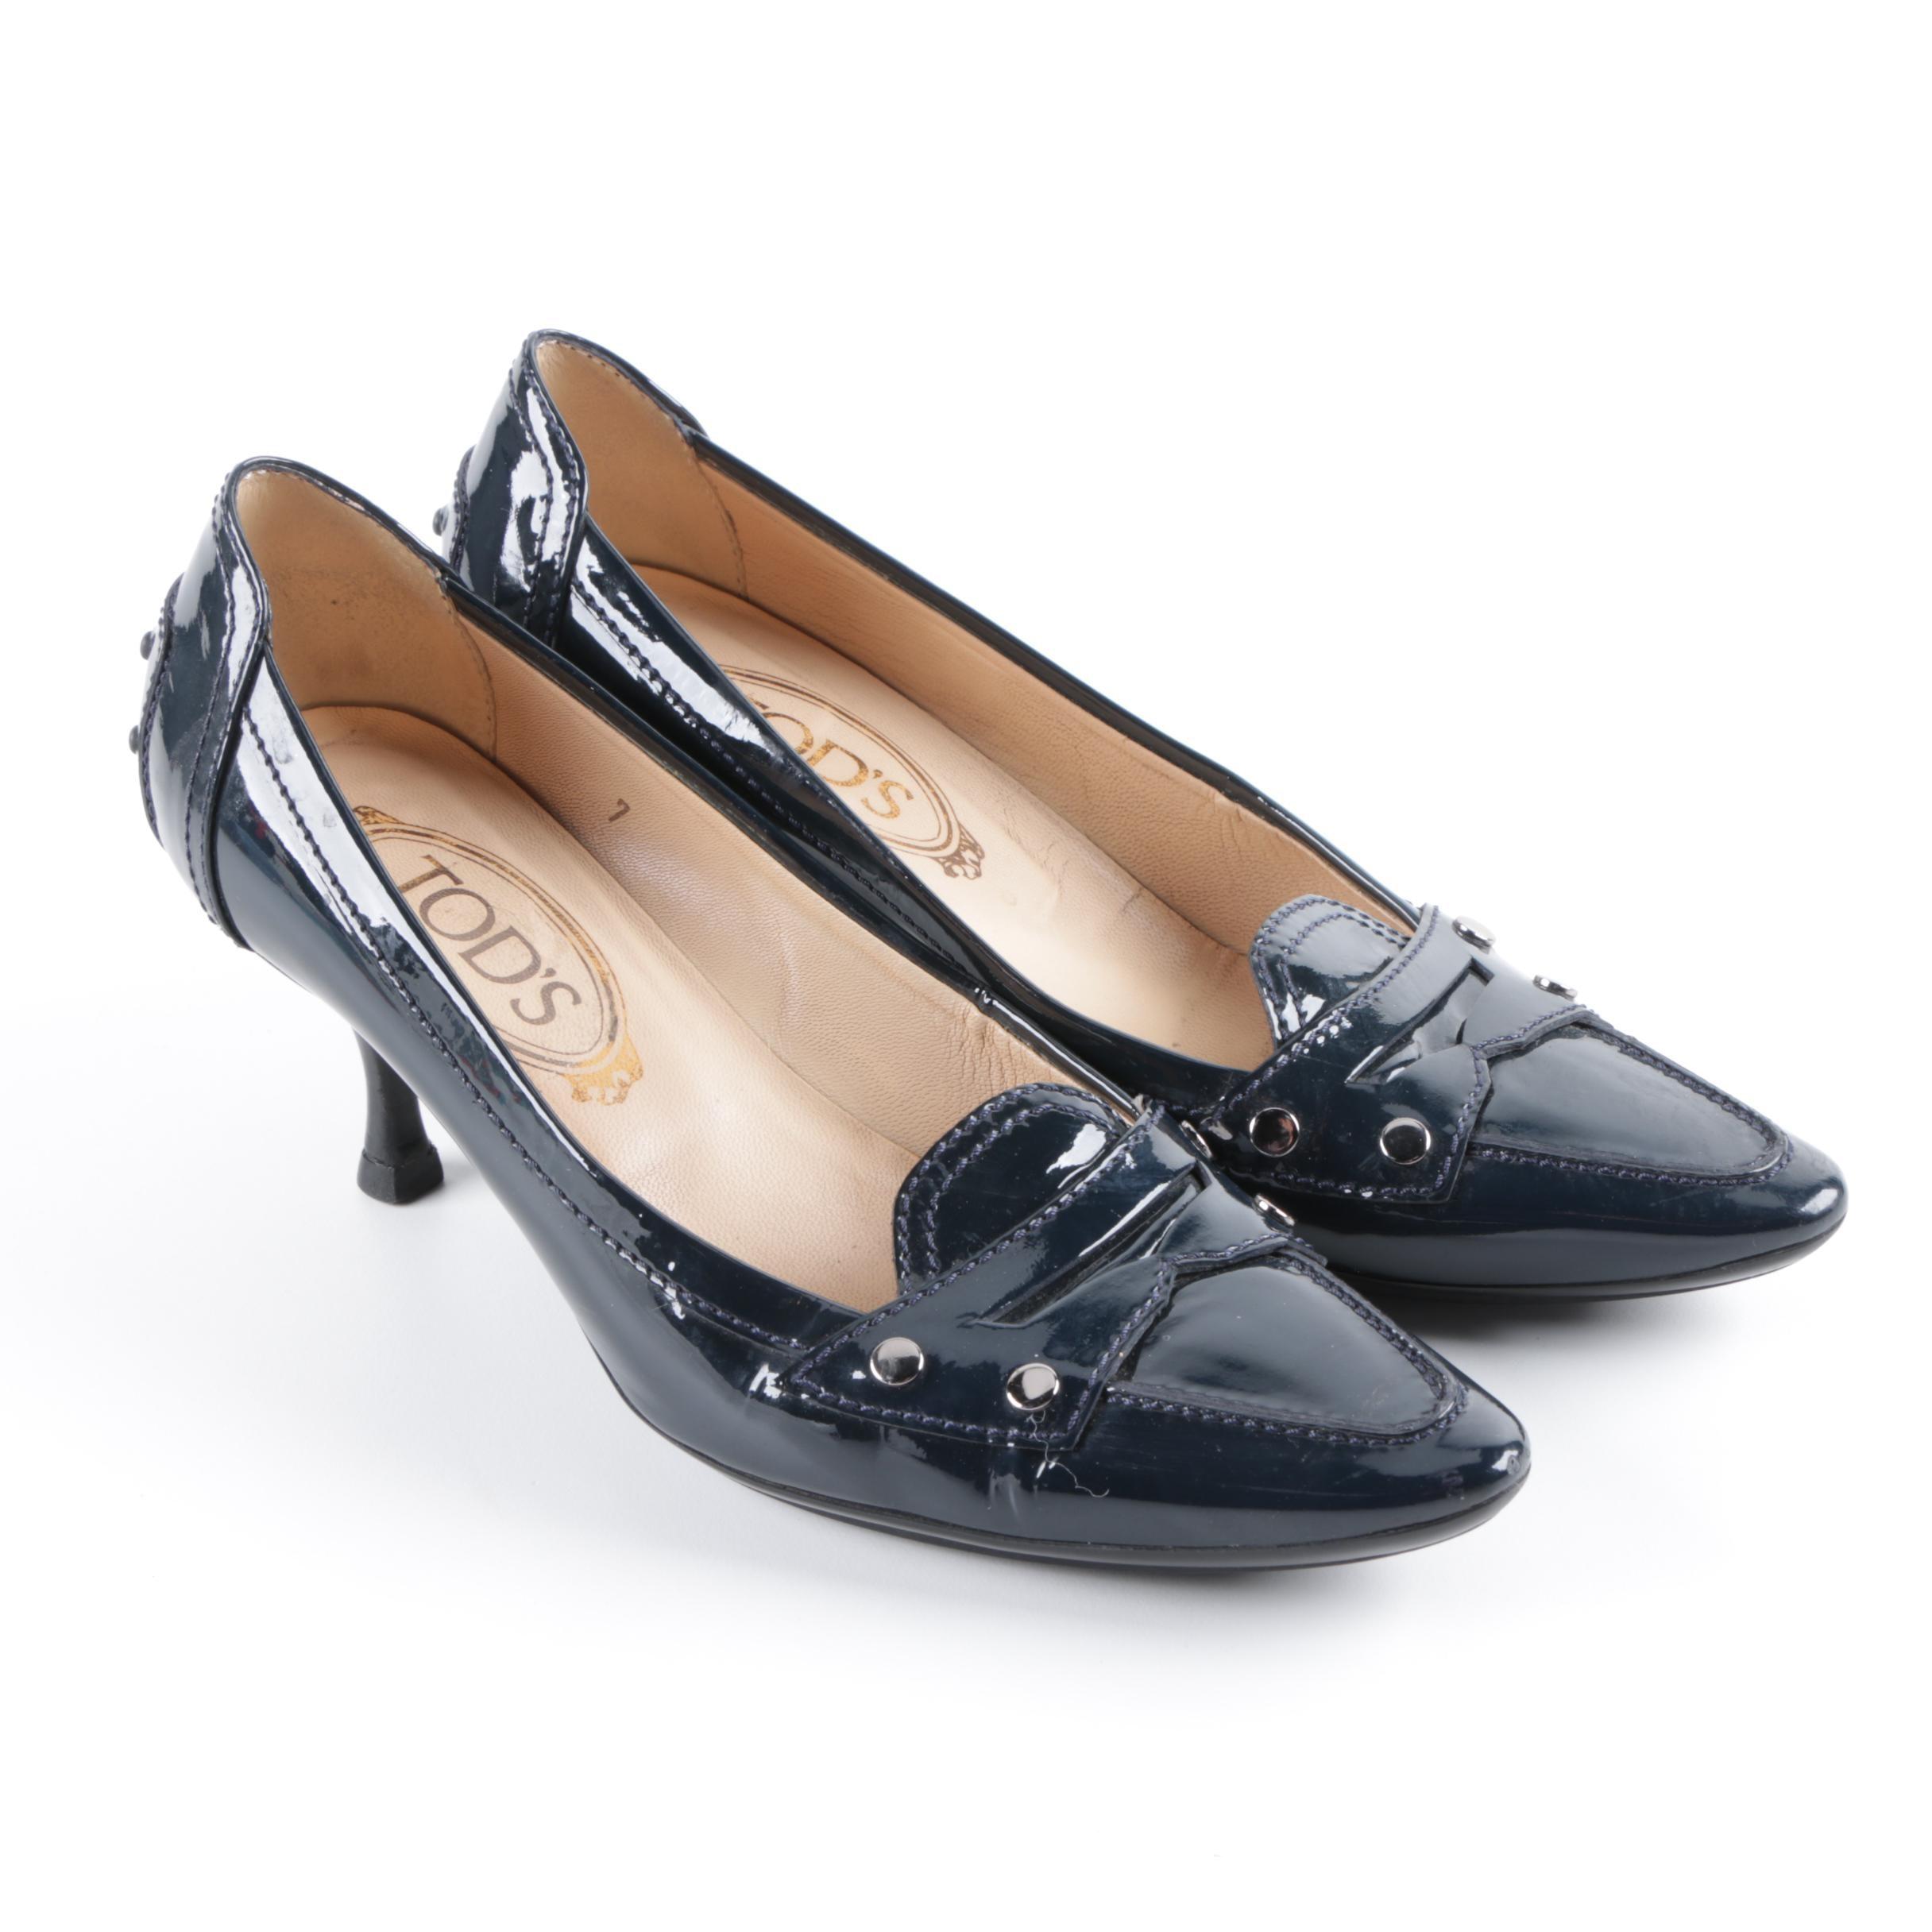 Tod's Navy Blue Patent Leather Kitten Heels